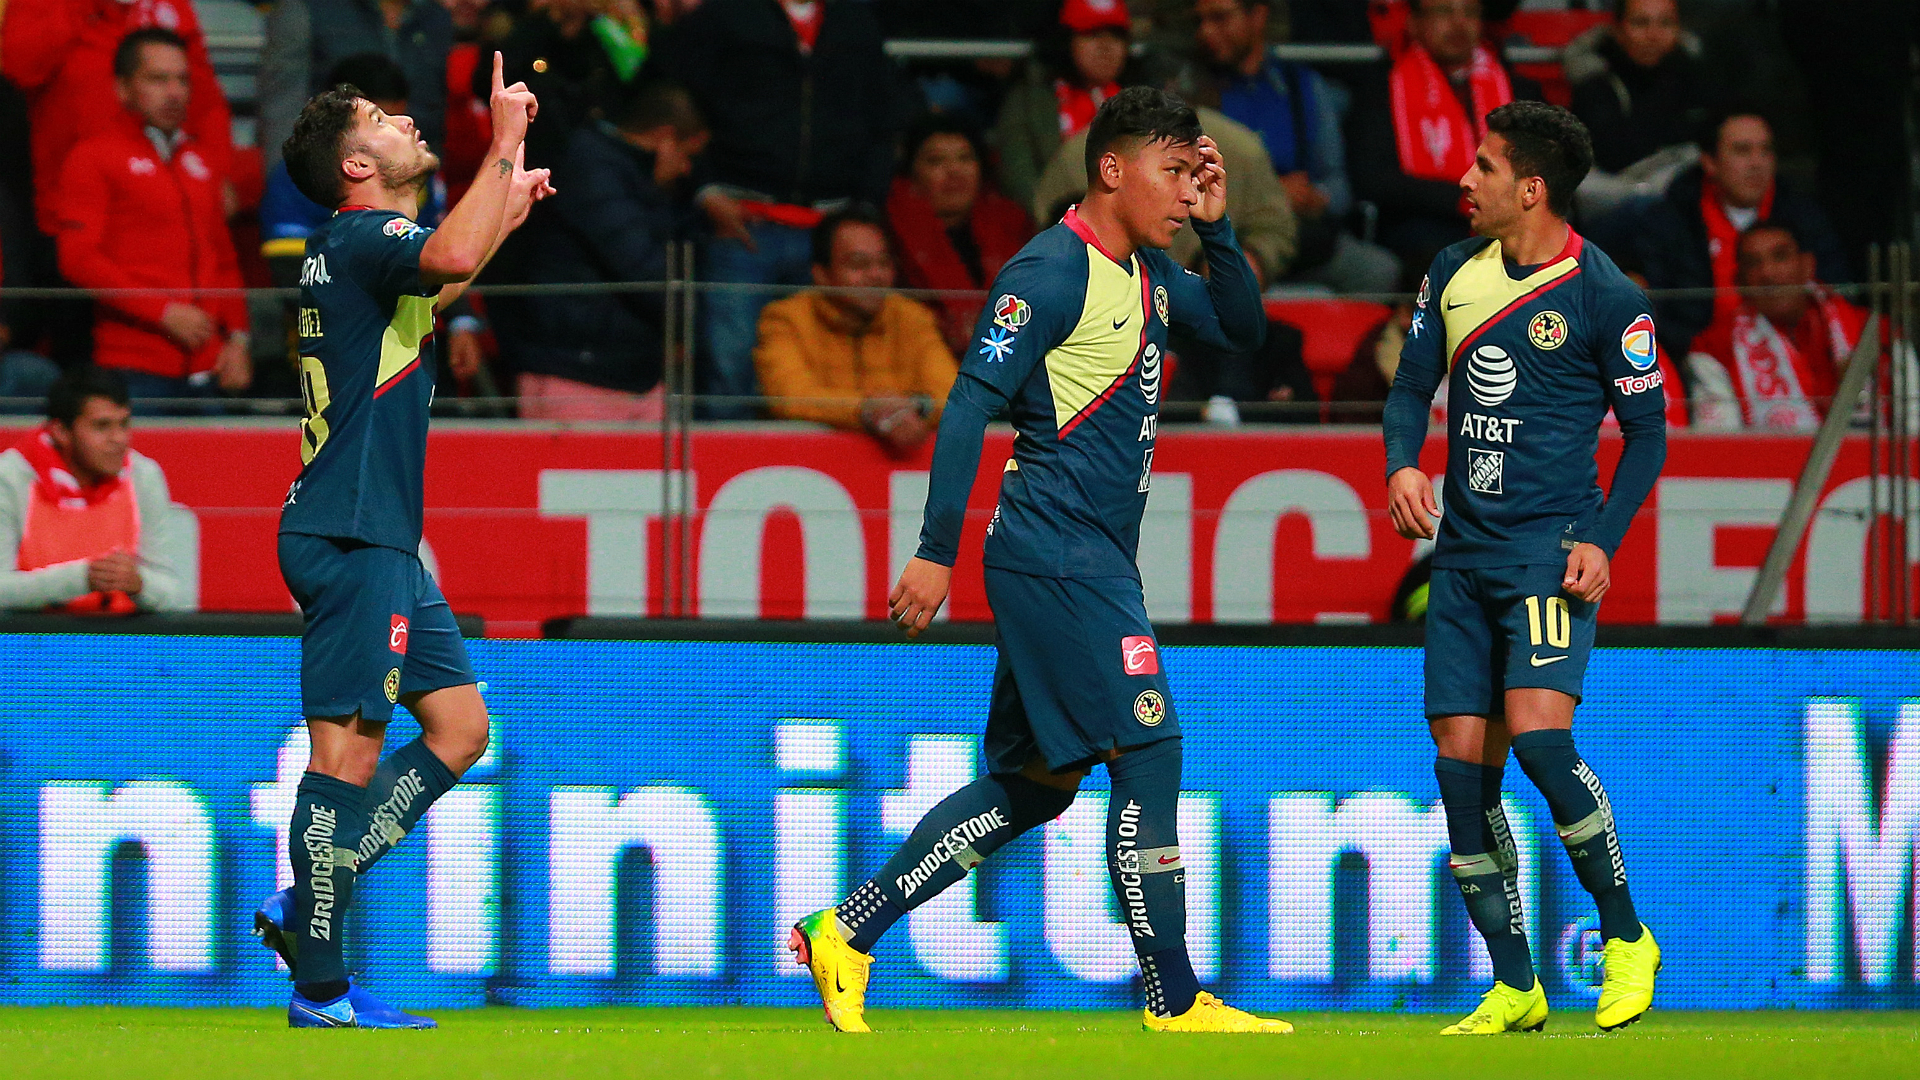 Toluca - América Liguilla Apertura 2018